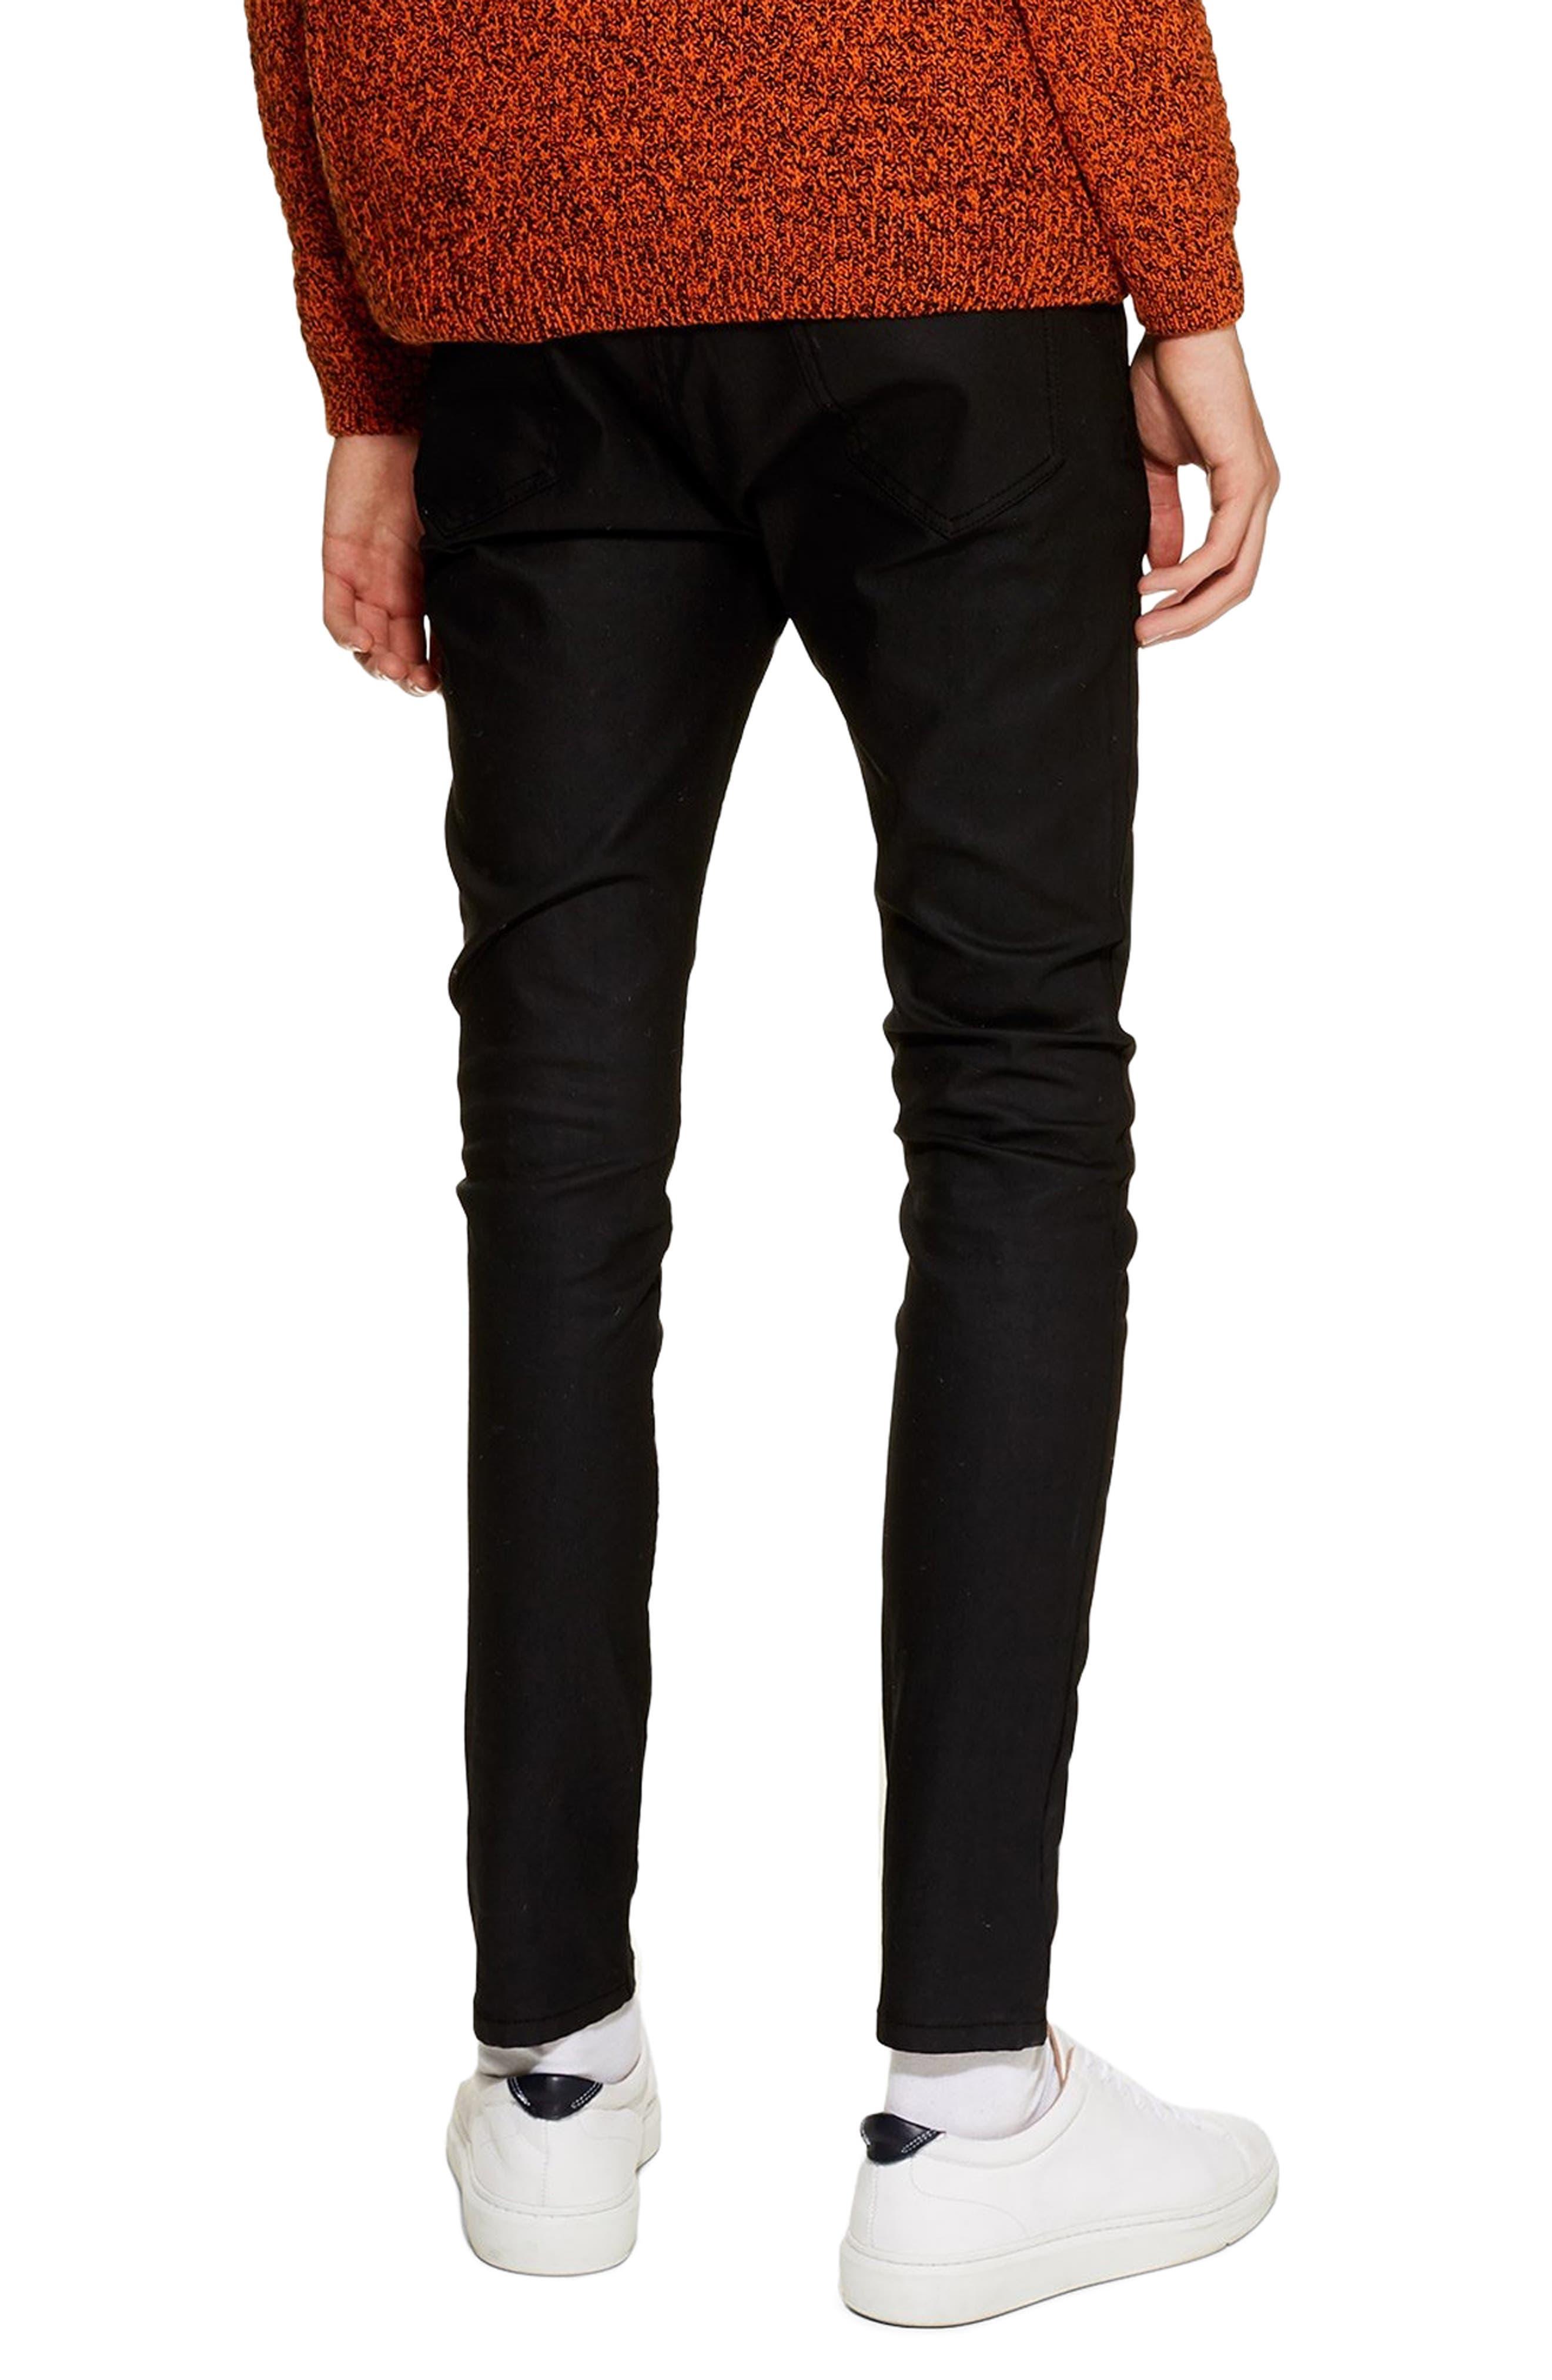 TOPMAN, Coated Denim Skinny Jeans, Alternate thumbnail 2, color, BLACK